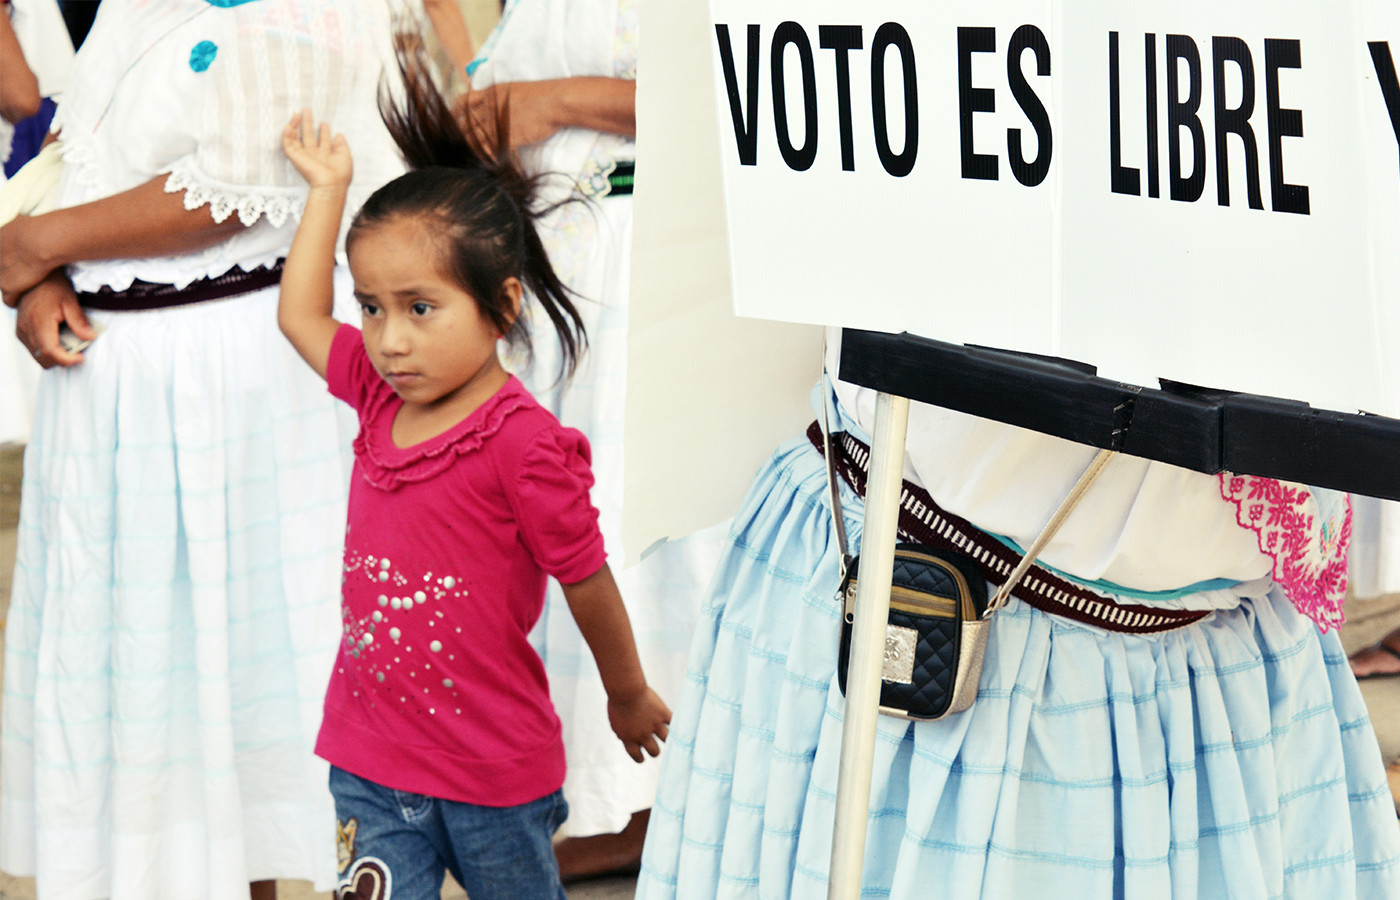 Jornada Electoral16.jpg